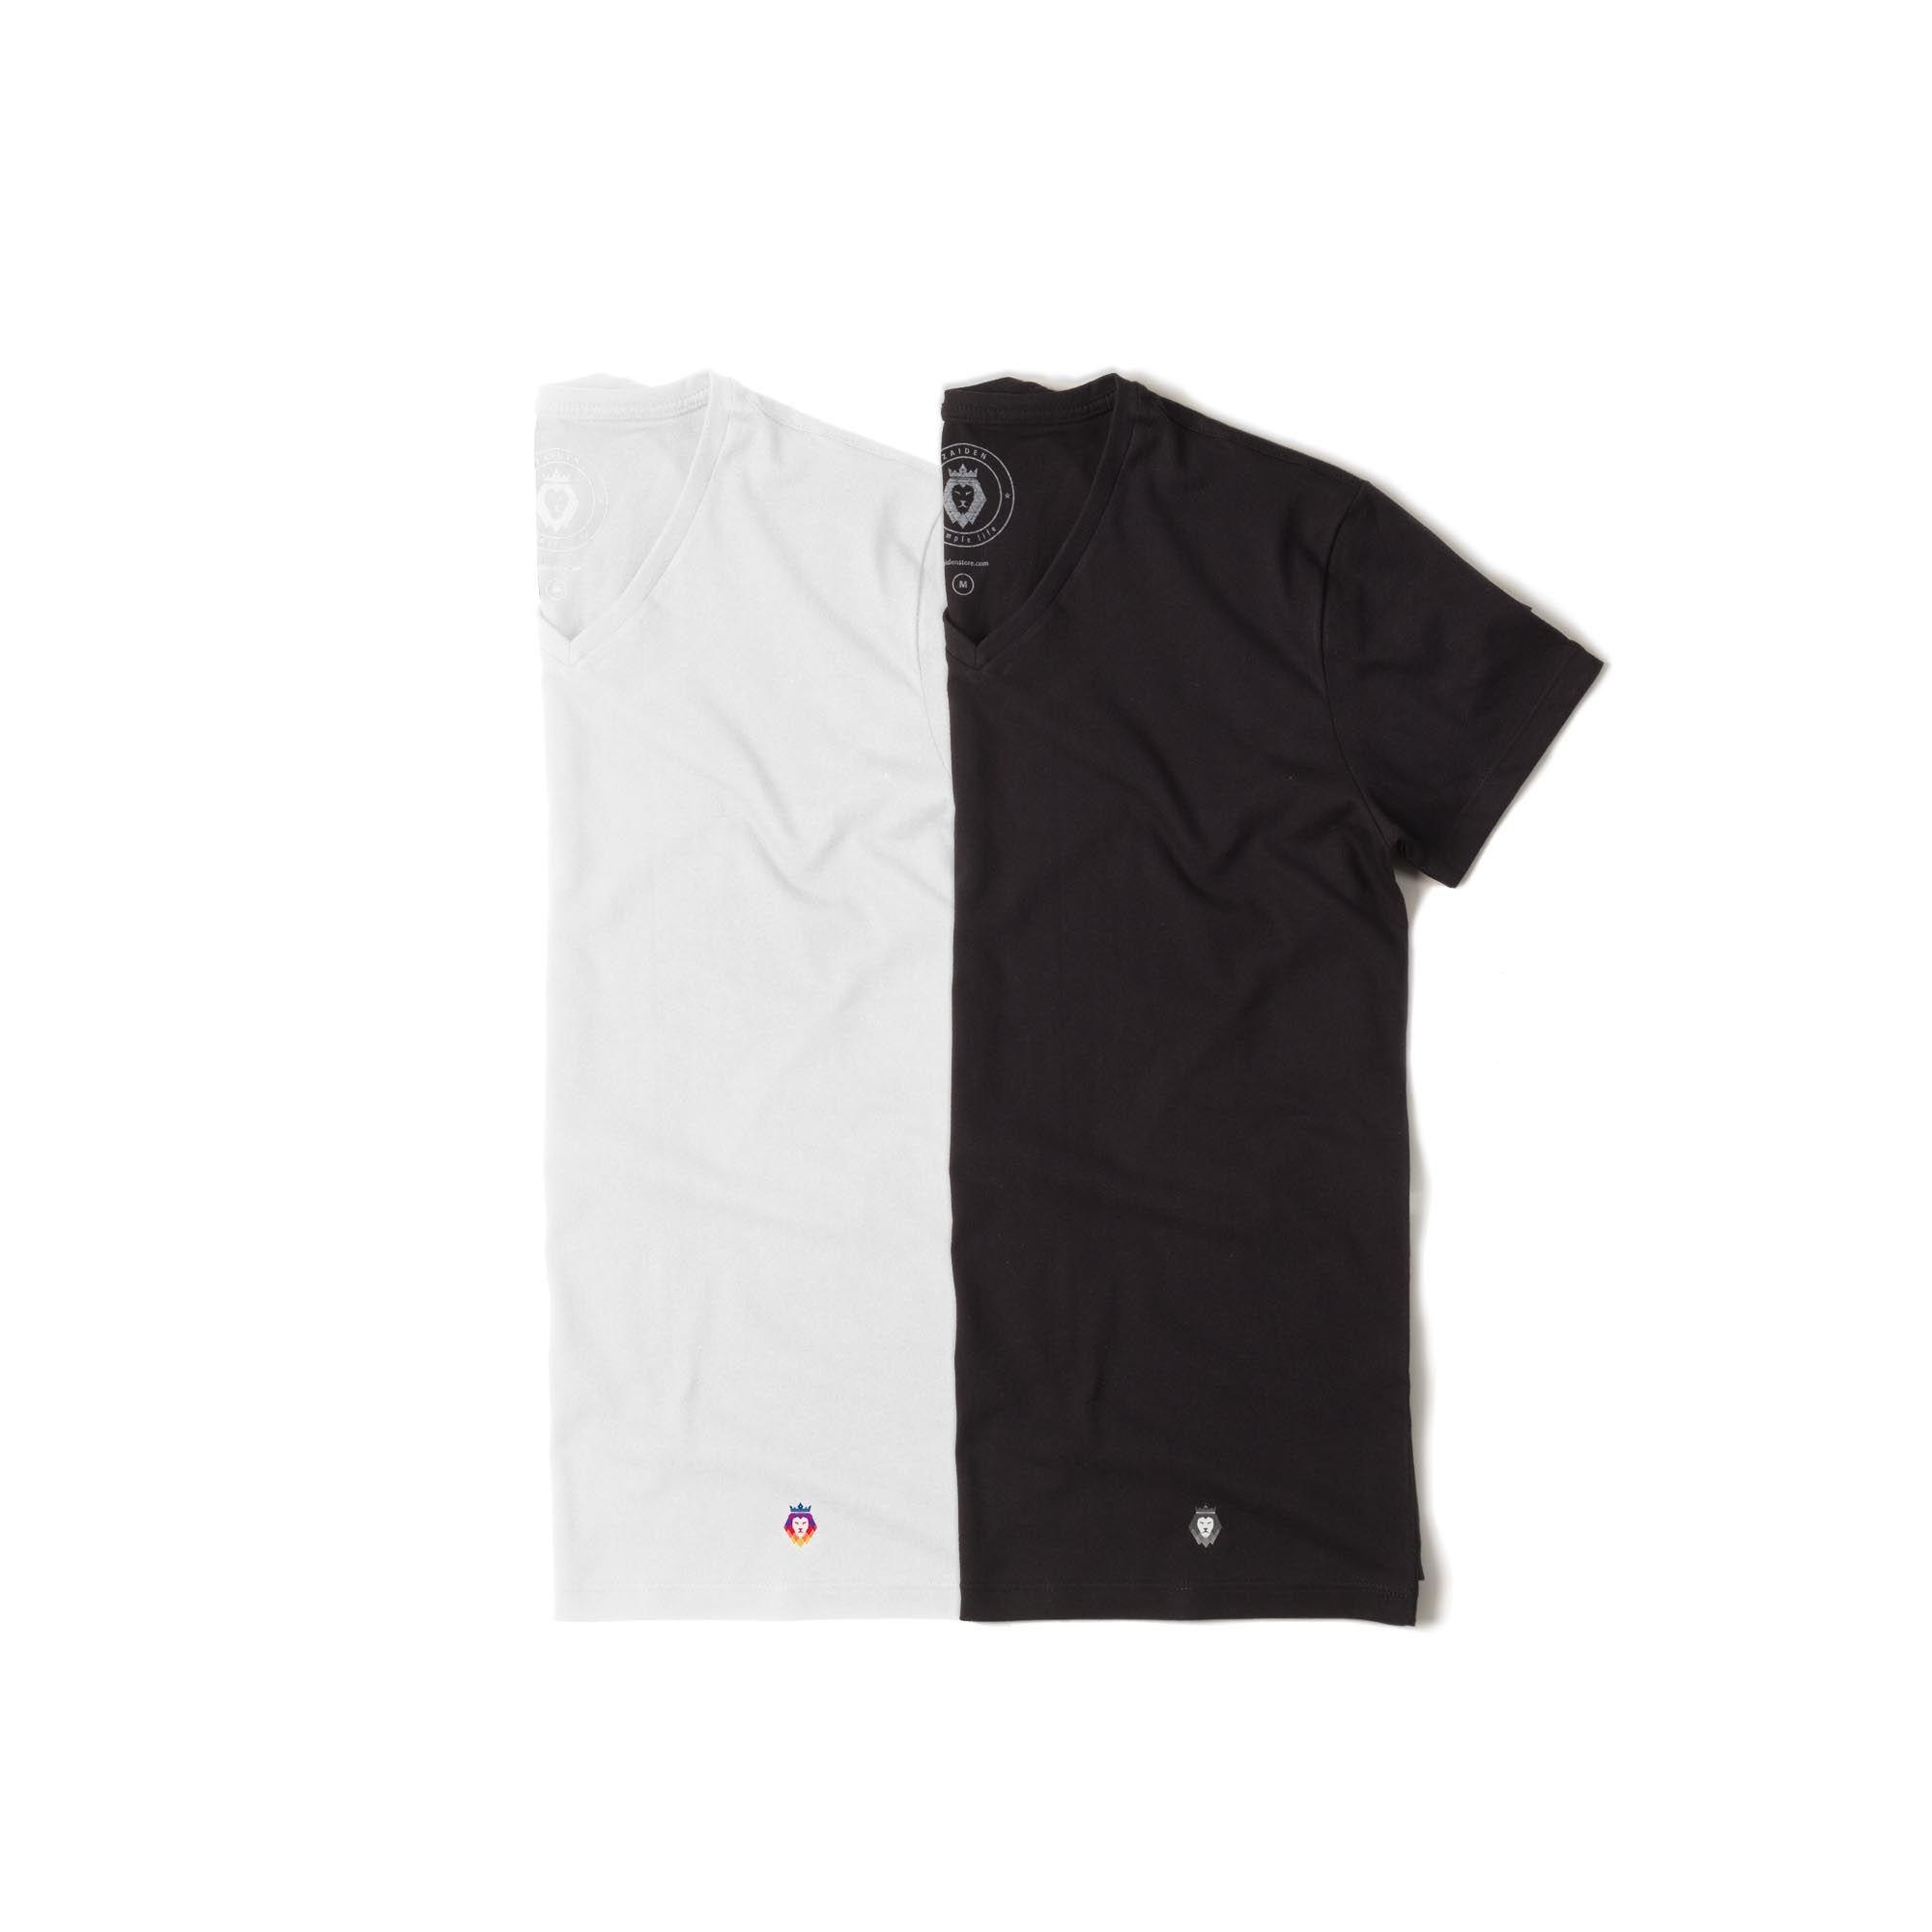 Kit 2 T-Shirt Basic Zaiden Preta Branca Masculina